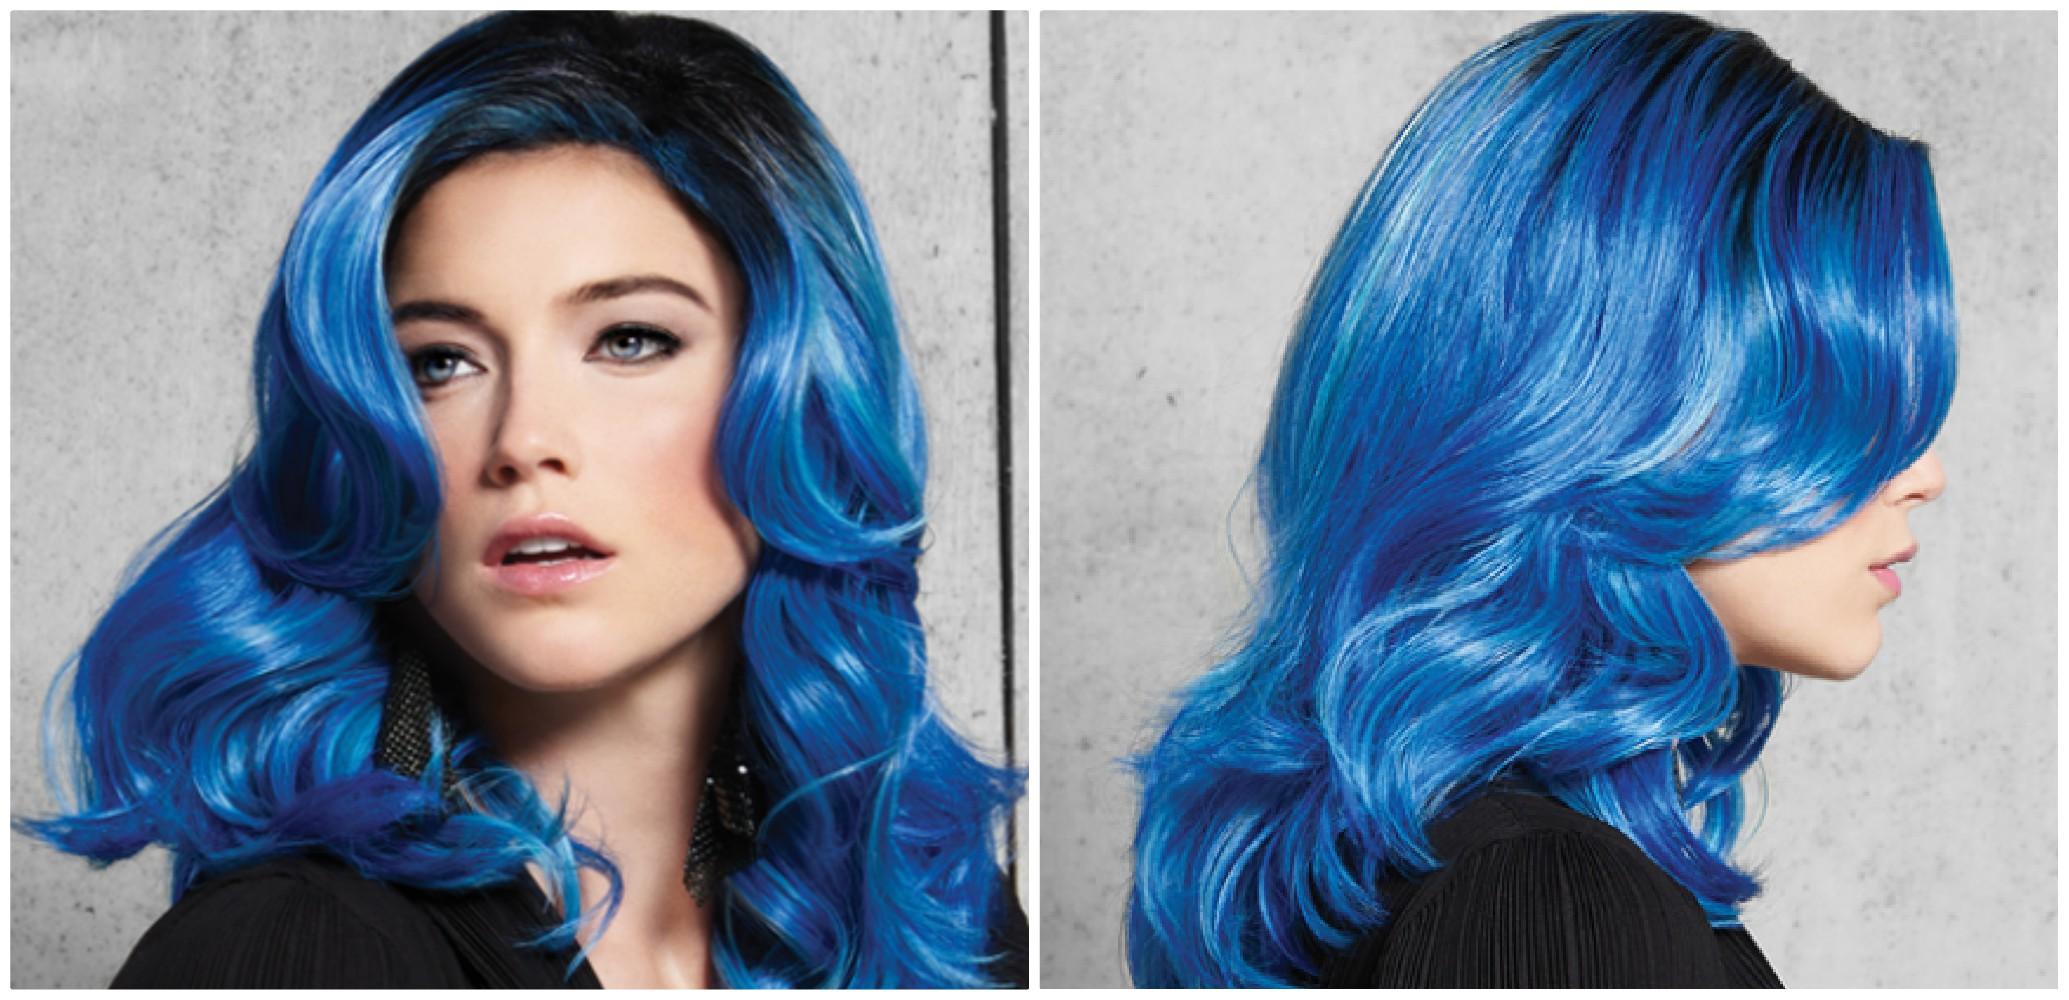 blue-wave-wig-by-hairdo